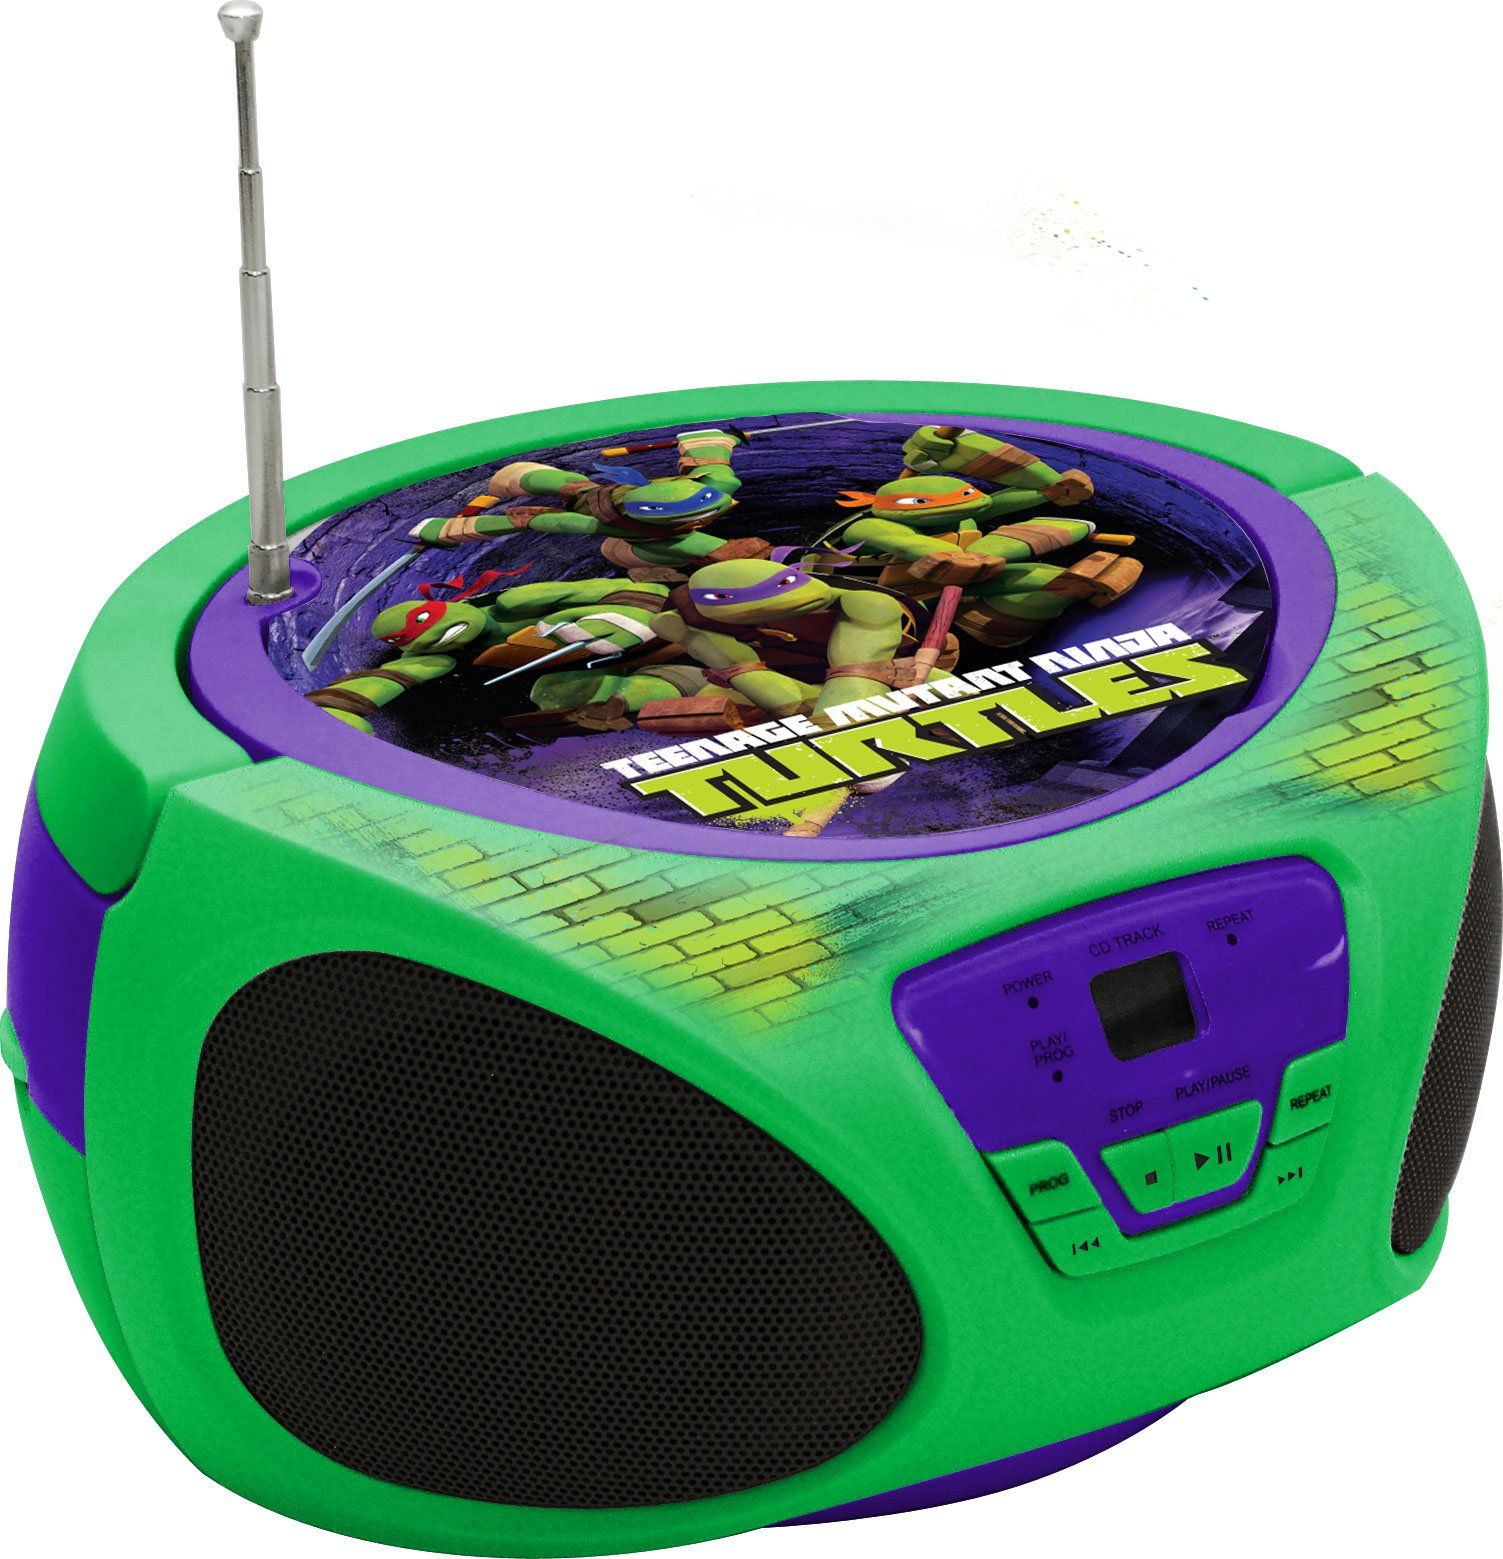 Teenage Mutant Ninja Turtles Boombox (57065) | Boomboxes | Pinterest